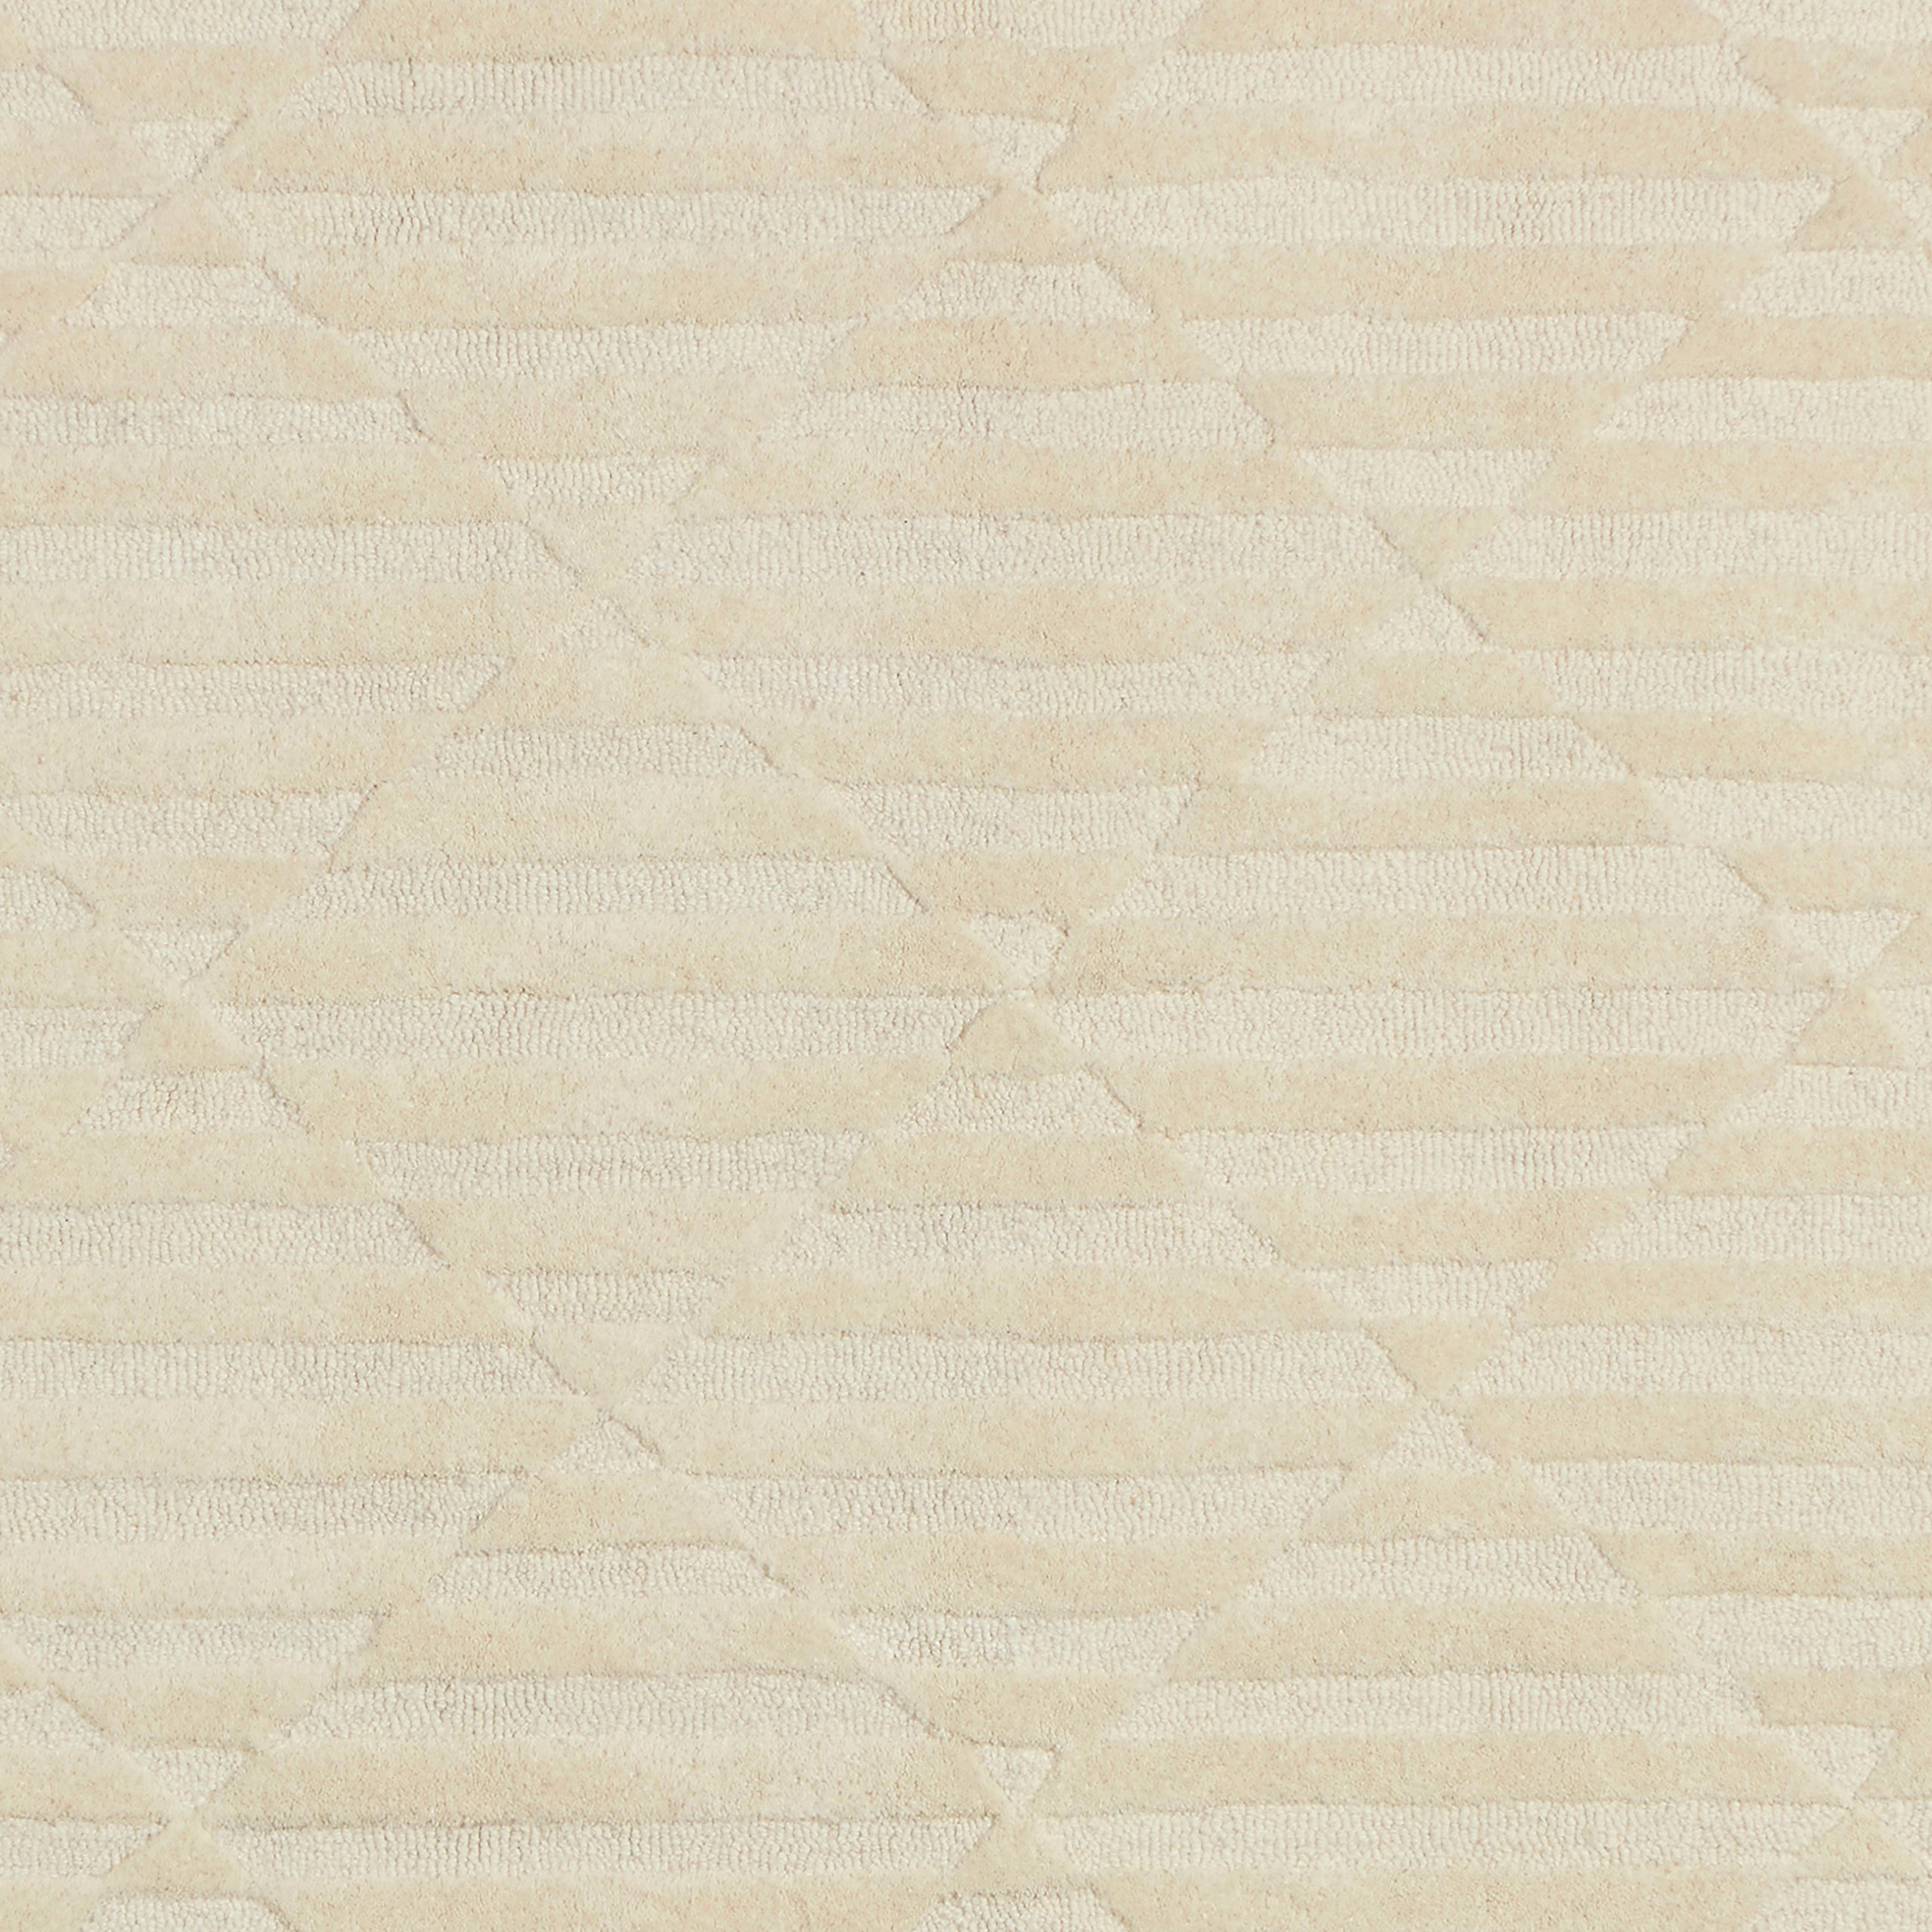 Rivet Geometric Criss-Cross Woven Wool Area Rug, 8' x 10', Cream by Rivet (Image #2)